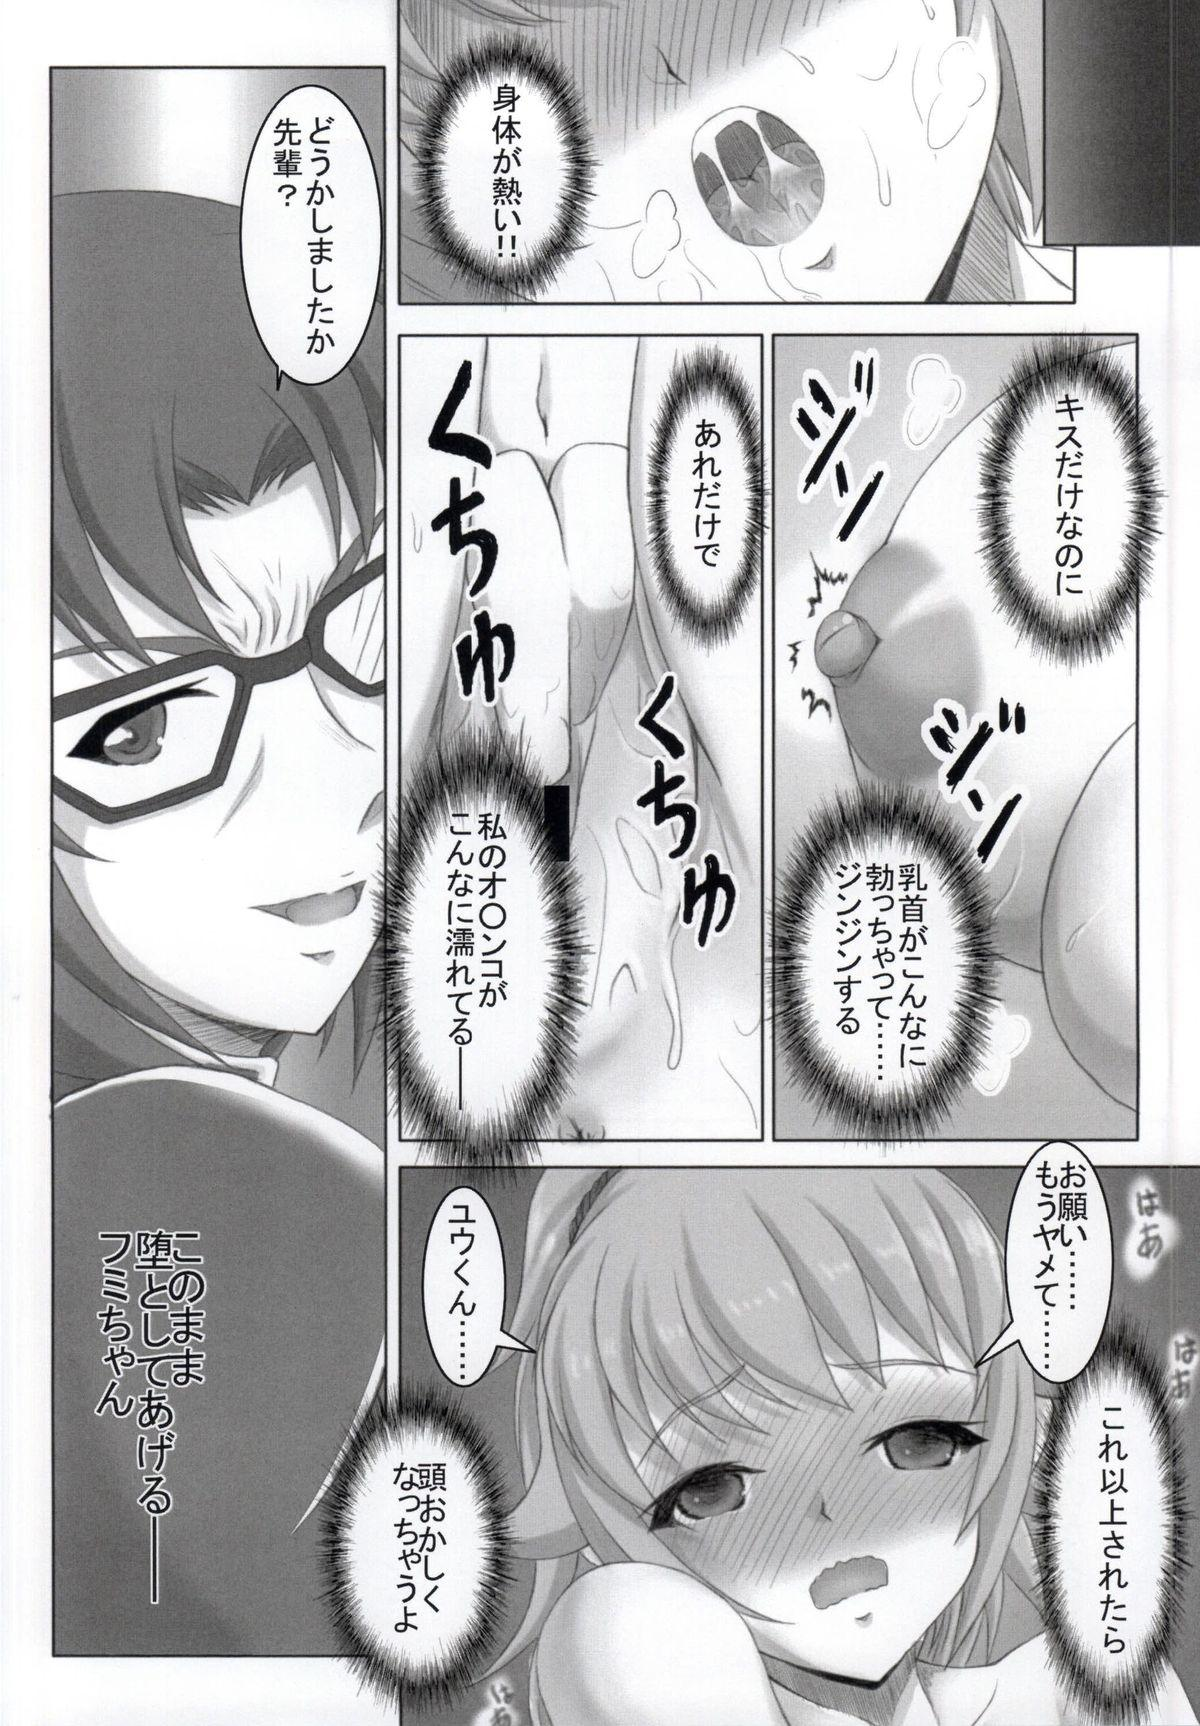 Fumina Senpai no NTR Jijou 5